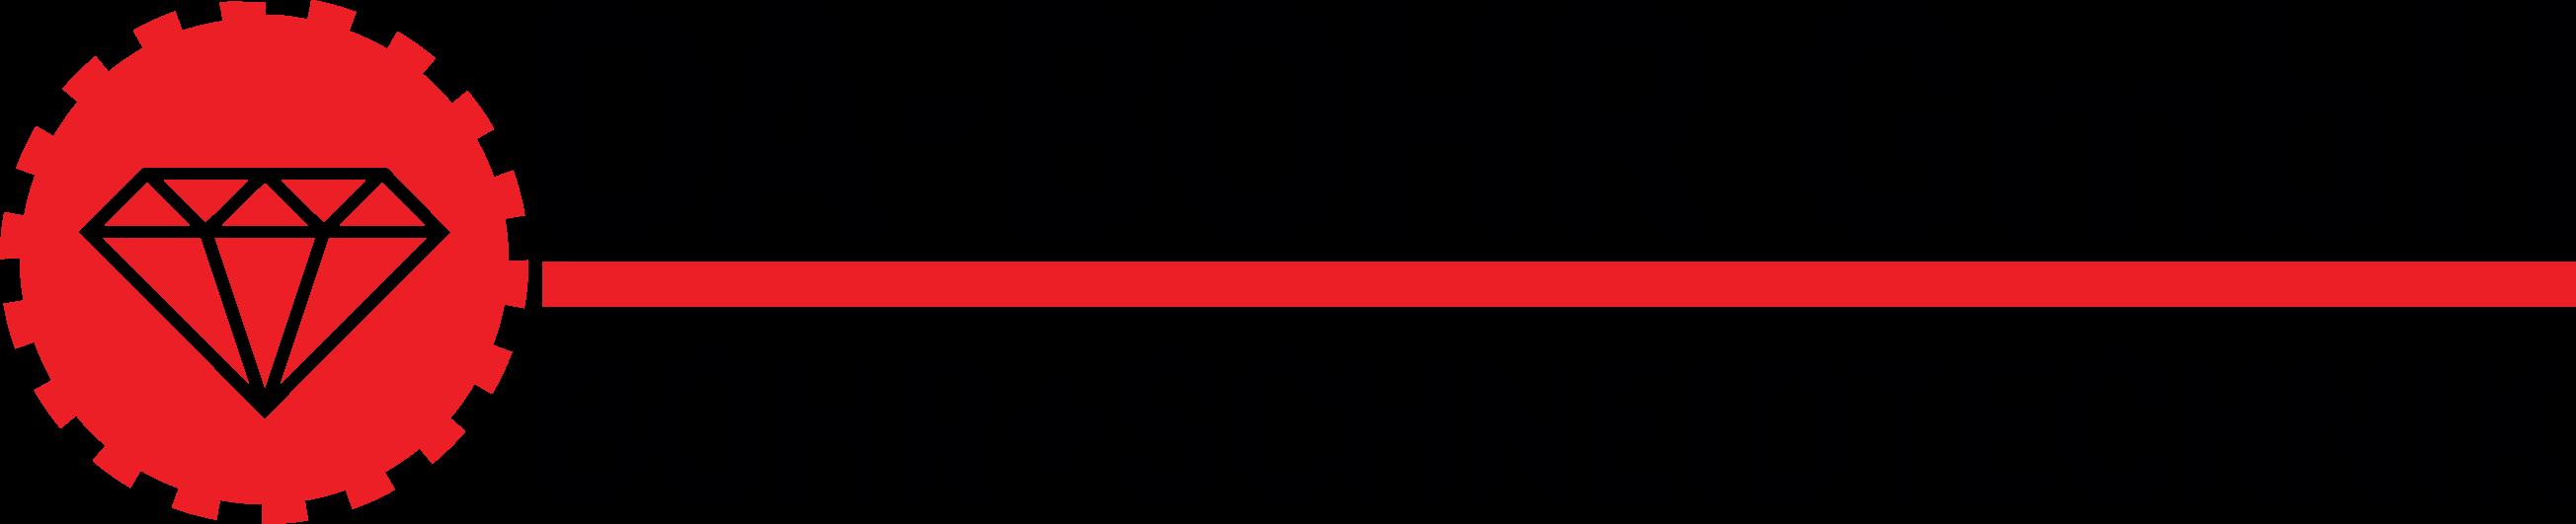 Da_Bohr GmbH